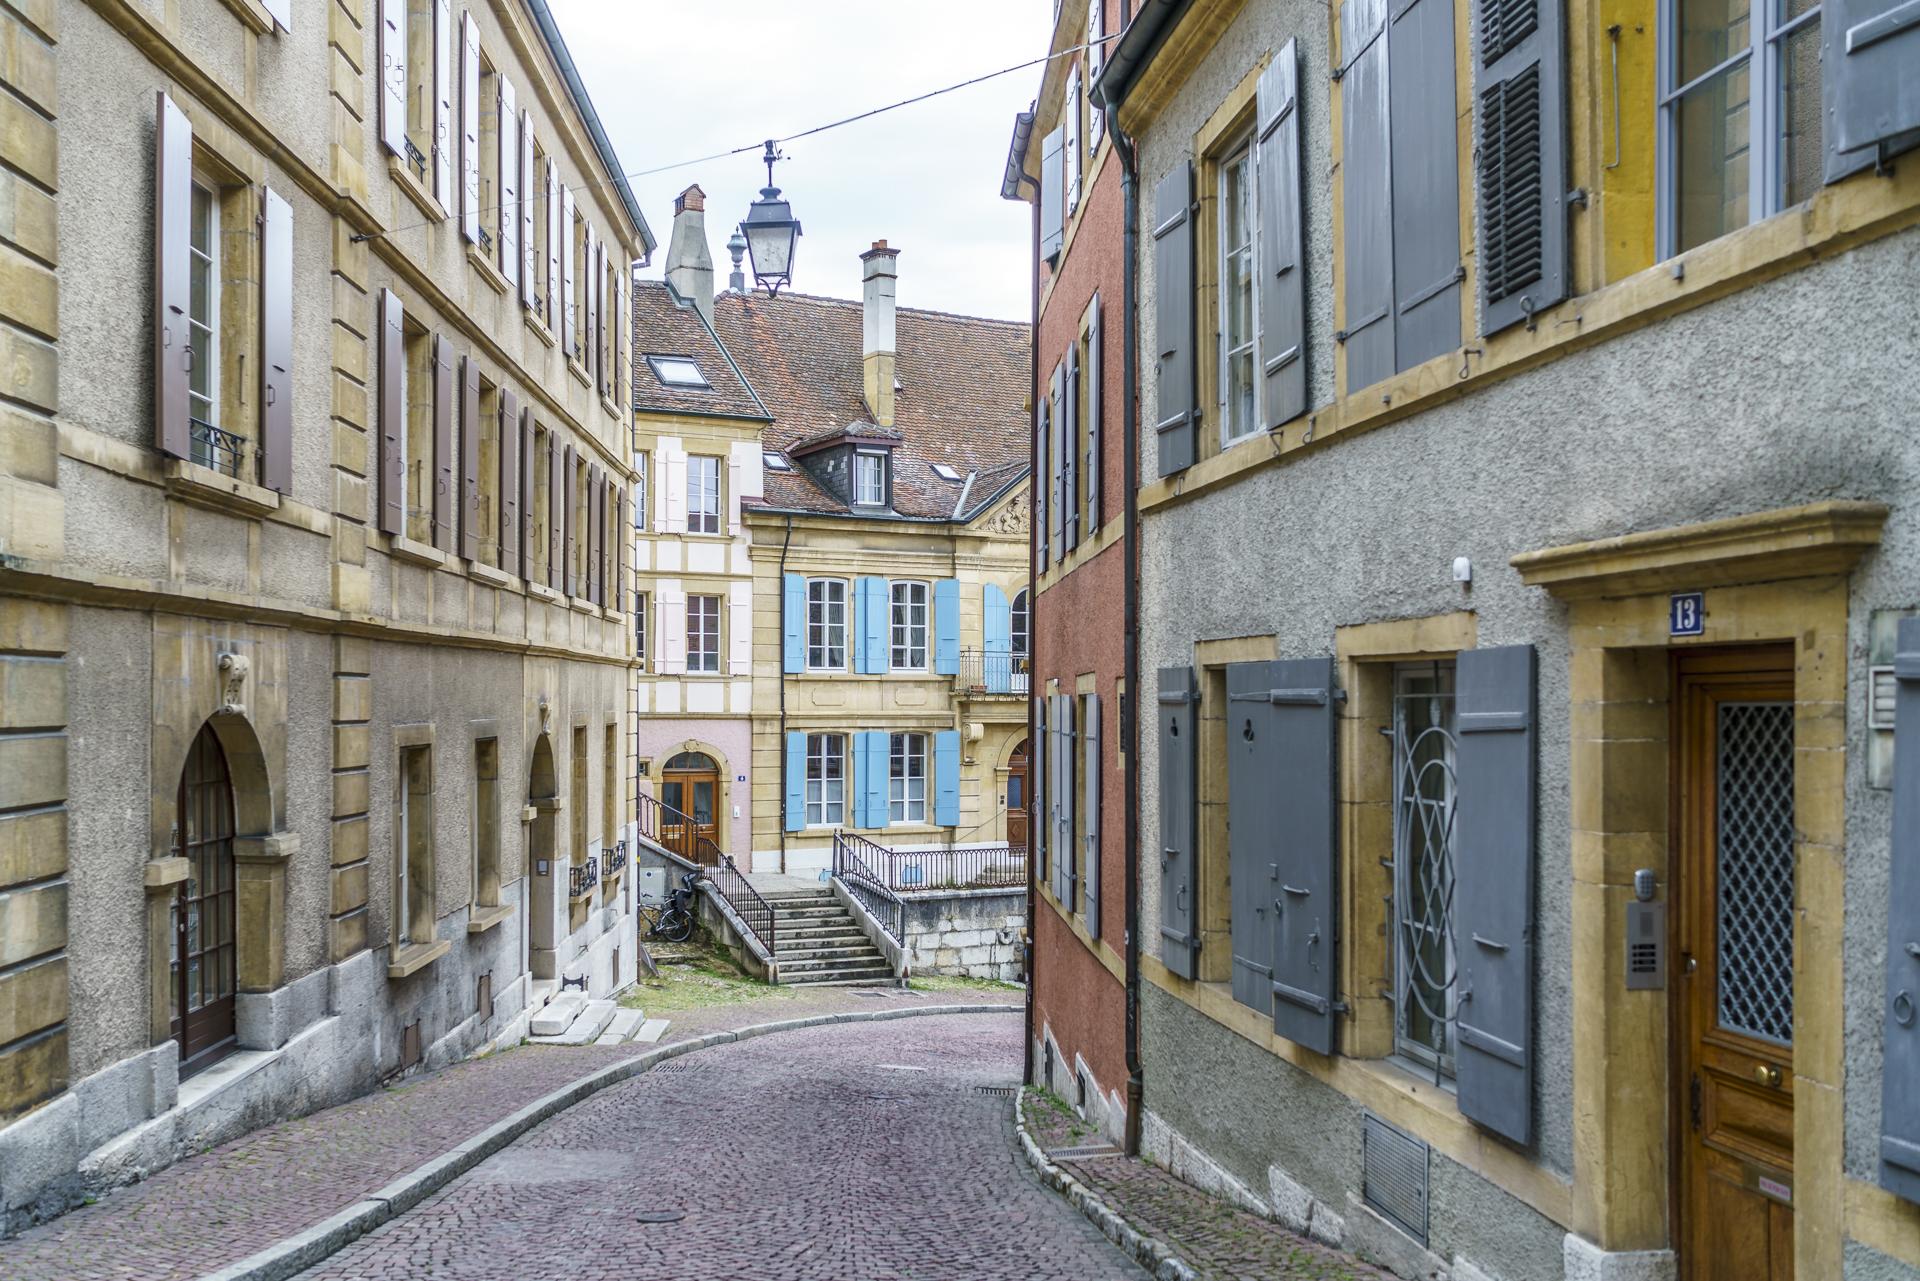 Rue-du-Chateau-Neuchatel